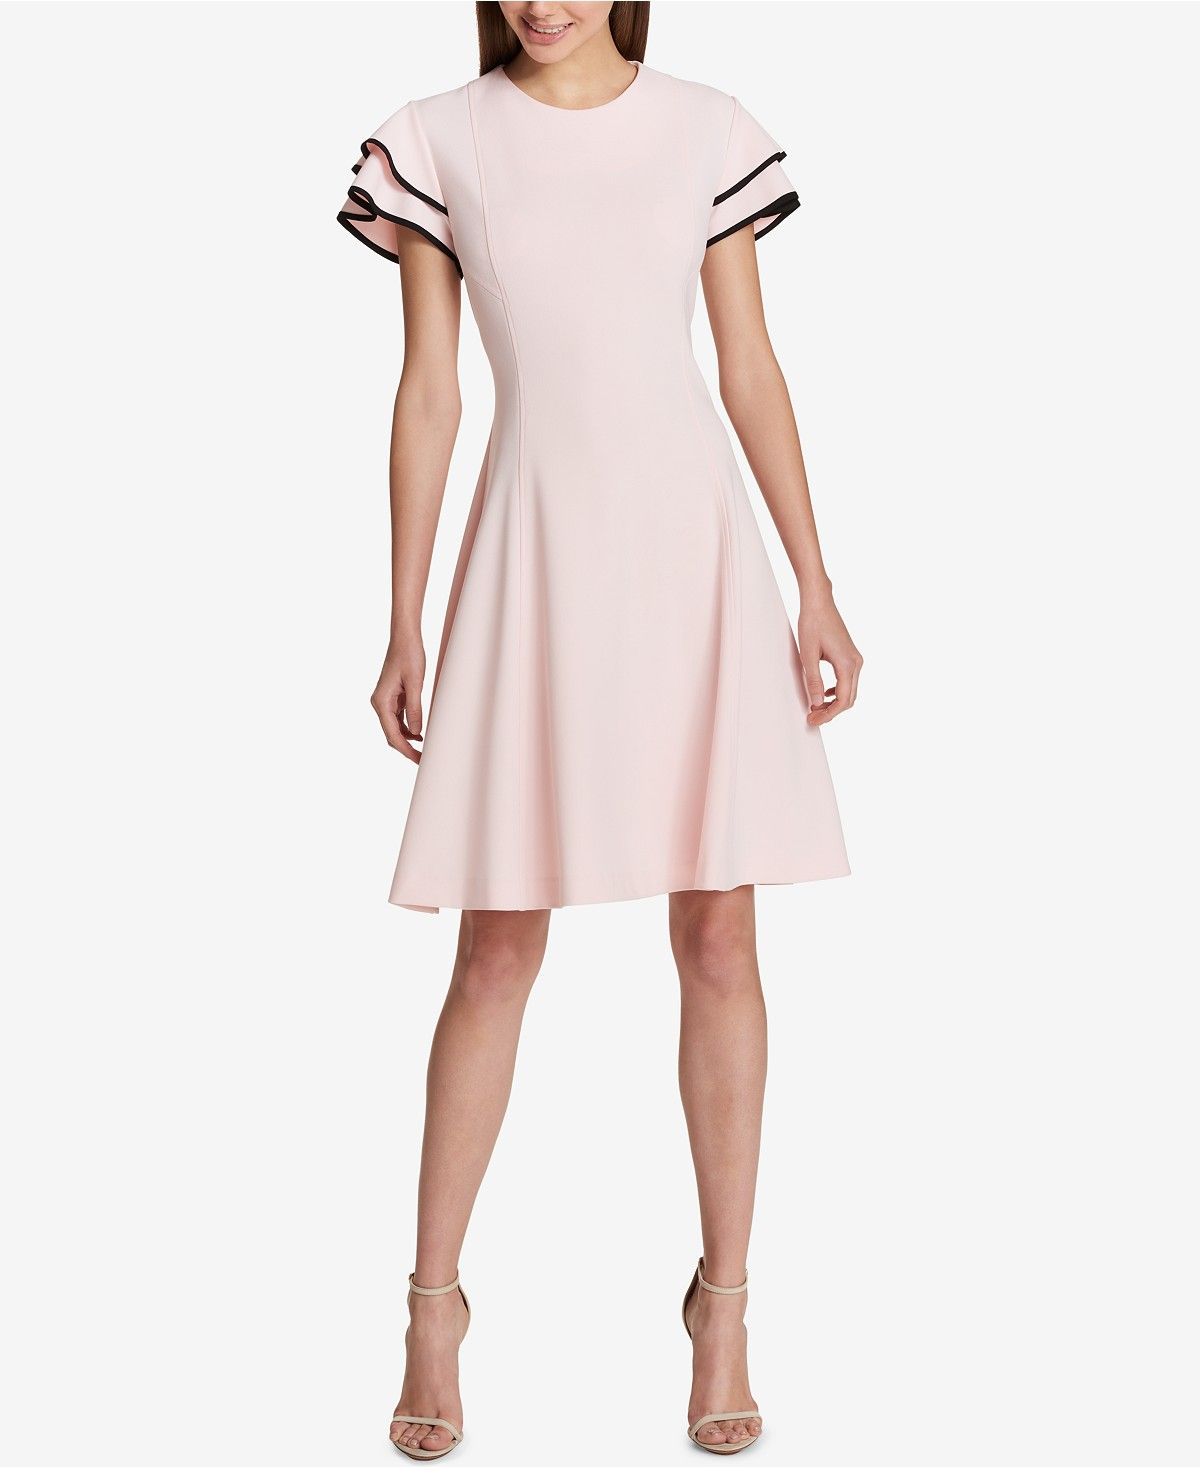 8e46a1ca1 Tommy Hilfiger Flutter-Sleeve Fit & Flare Dress - Dresses - Women - Macy's